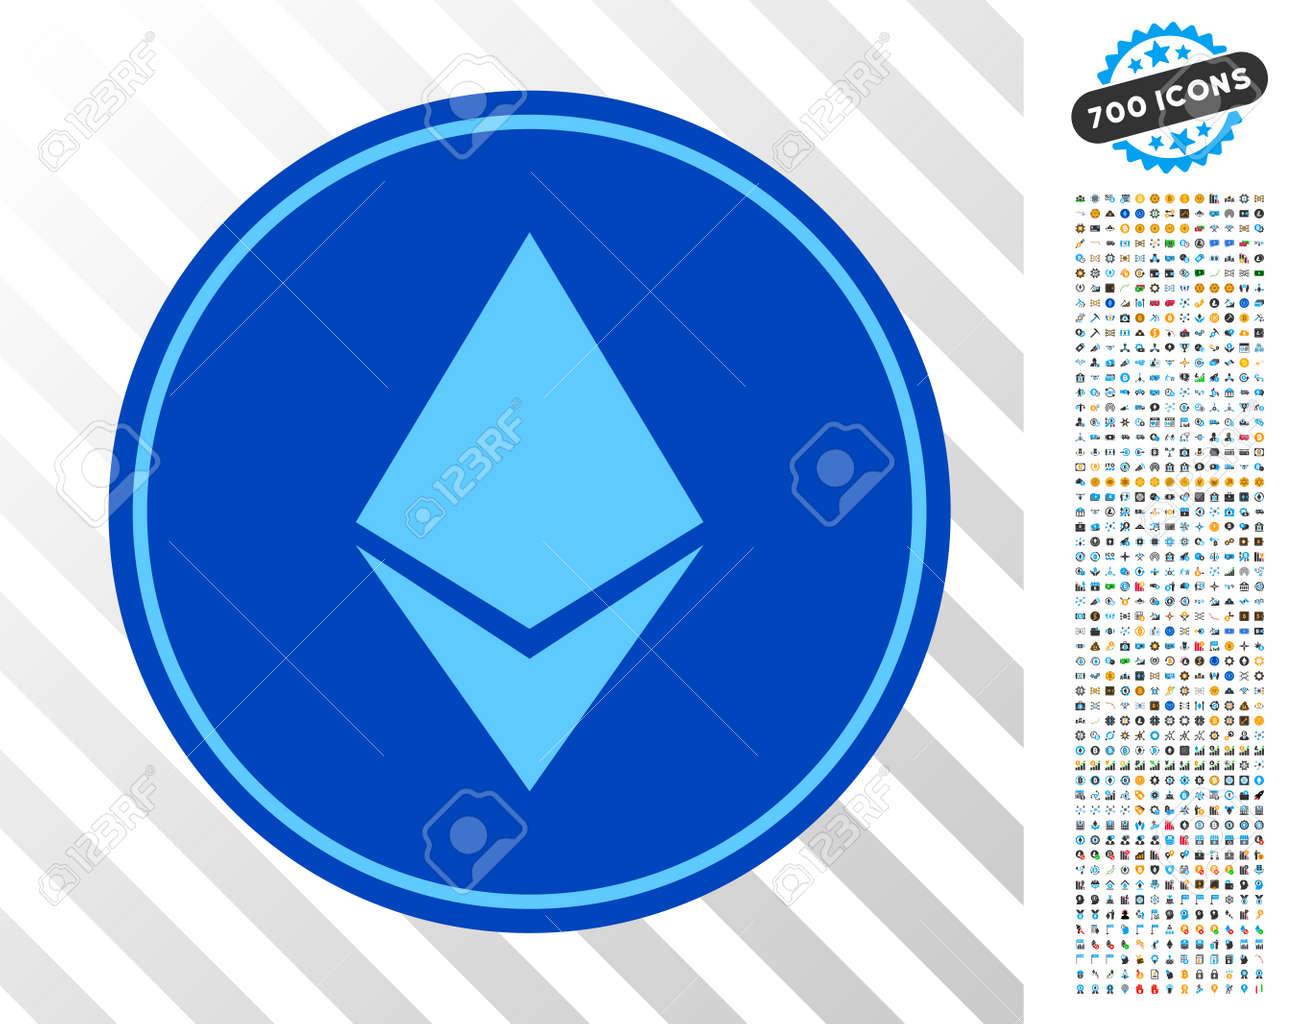 Genesis mining bitcoin mining is back limited pre order mining starts 15032018is it worth it